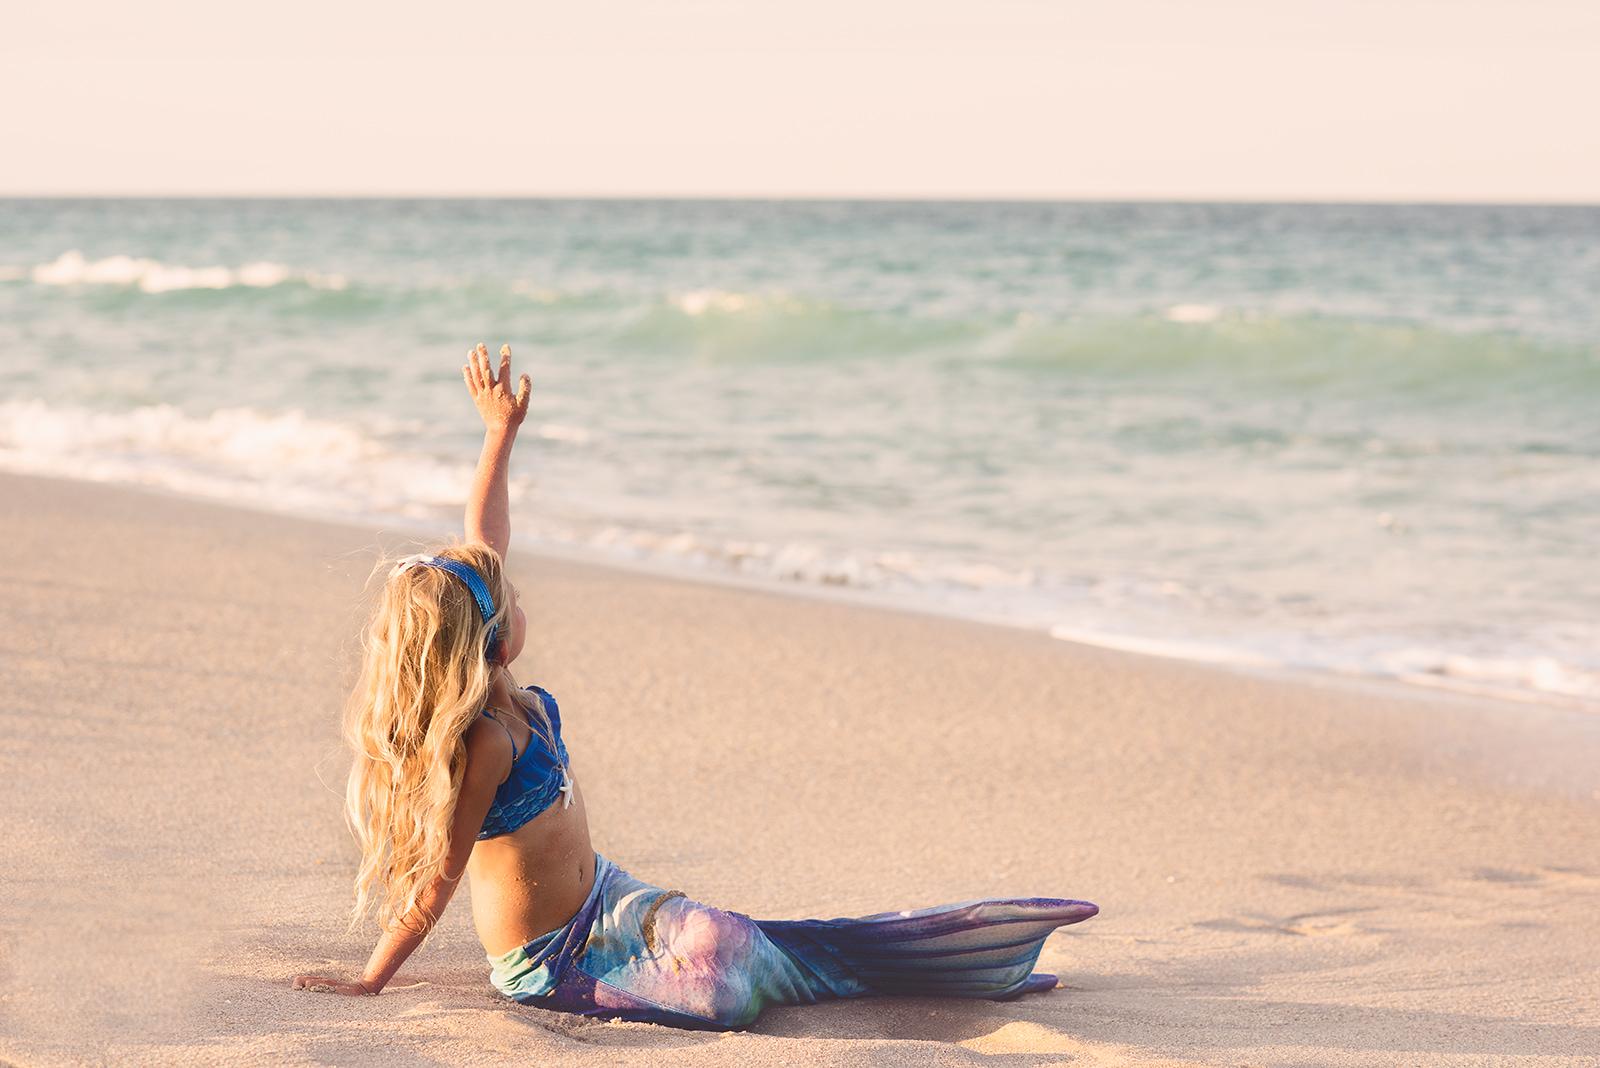 mermaid-photo-session-beach-sebastian-fl.jpg